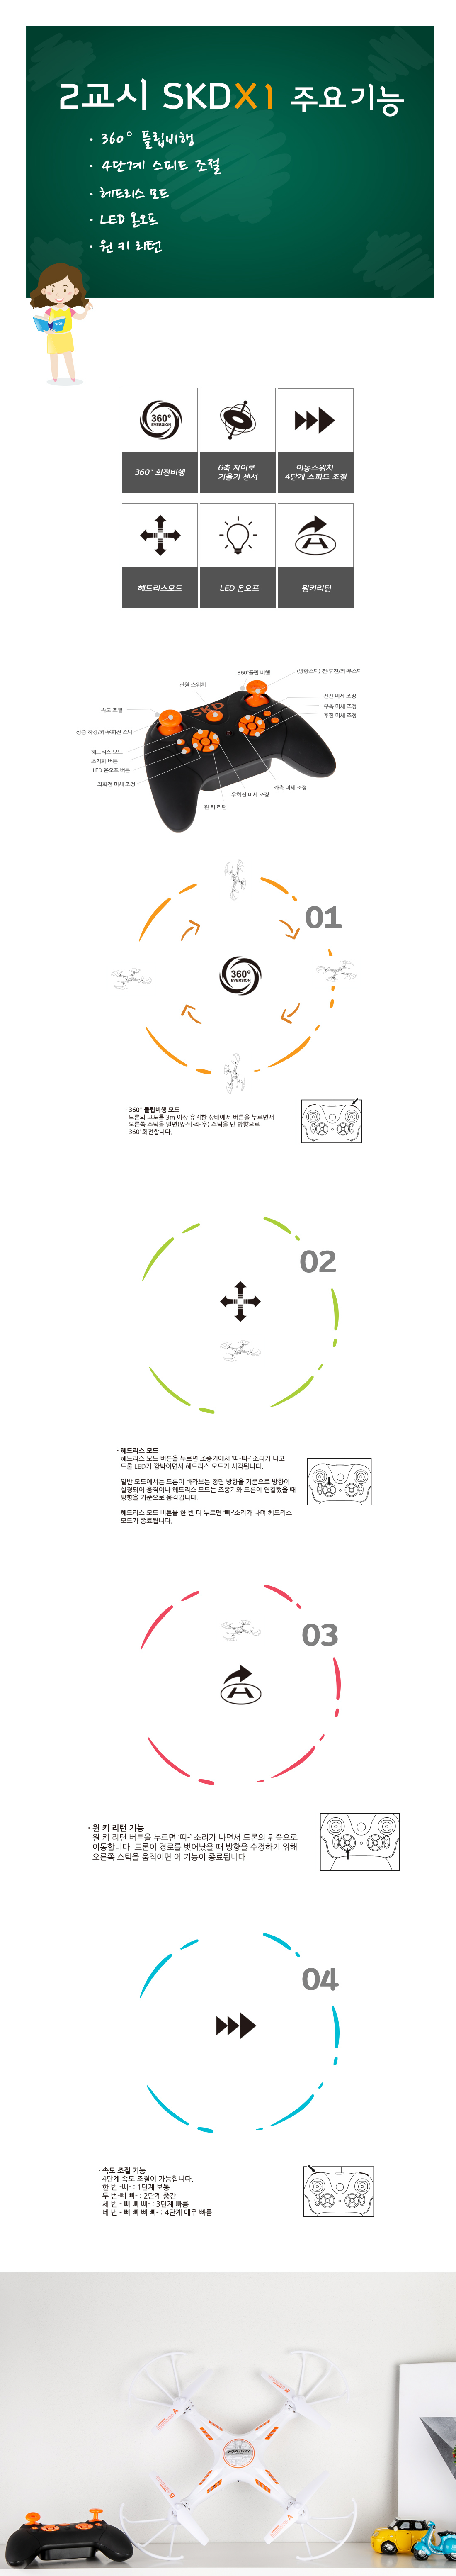 Flytec SKDX1 입문용 조립 DIY드론 무 납땜 - 월드스카이, 59,000원, R/C 드론/쿼드콥터, 드론